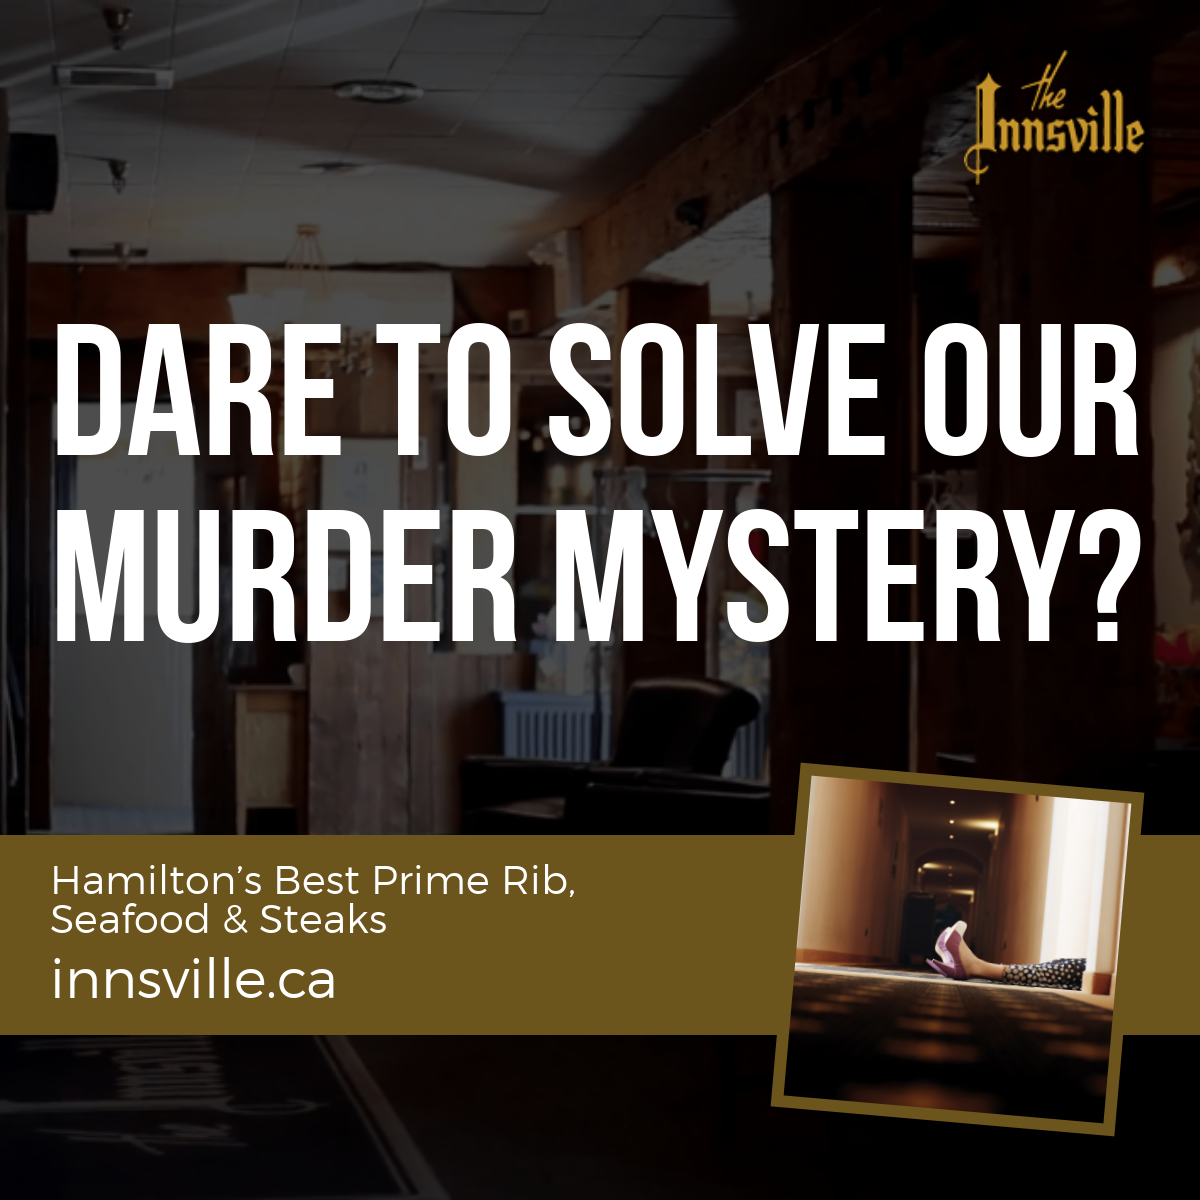 Murder Mystery at The Innsville